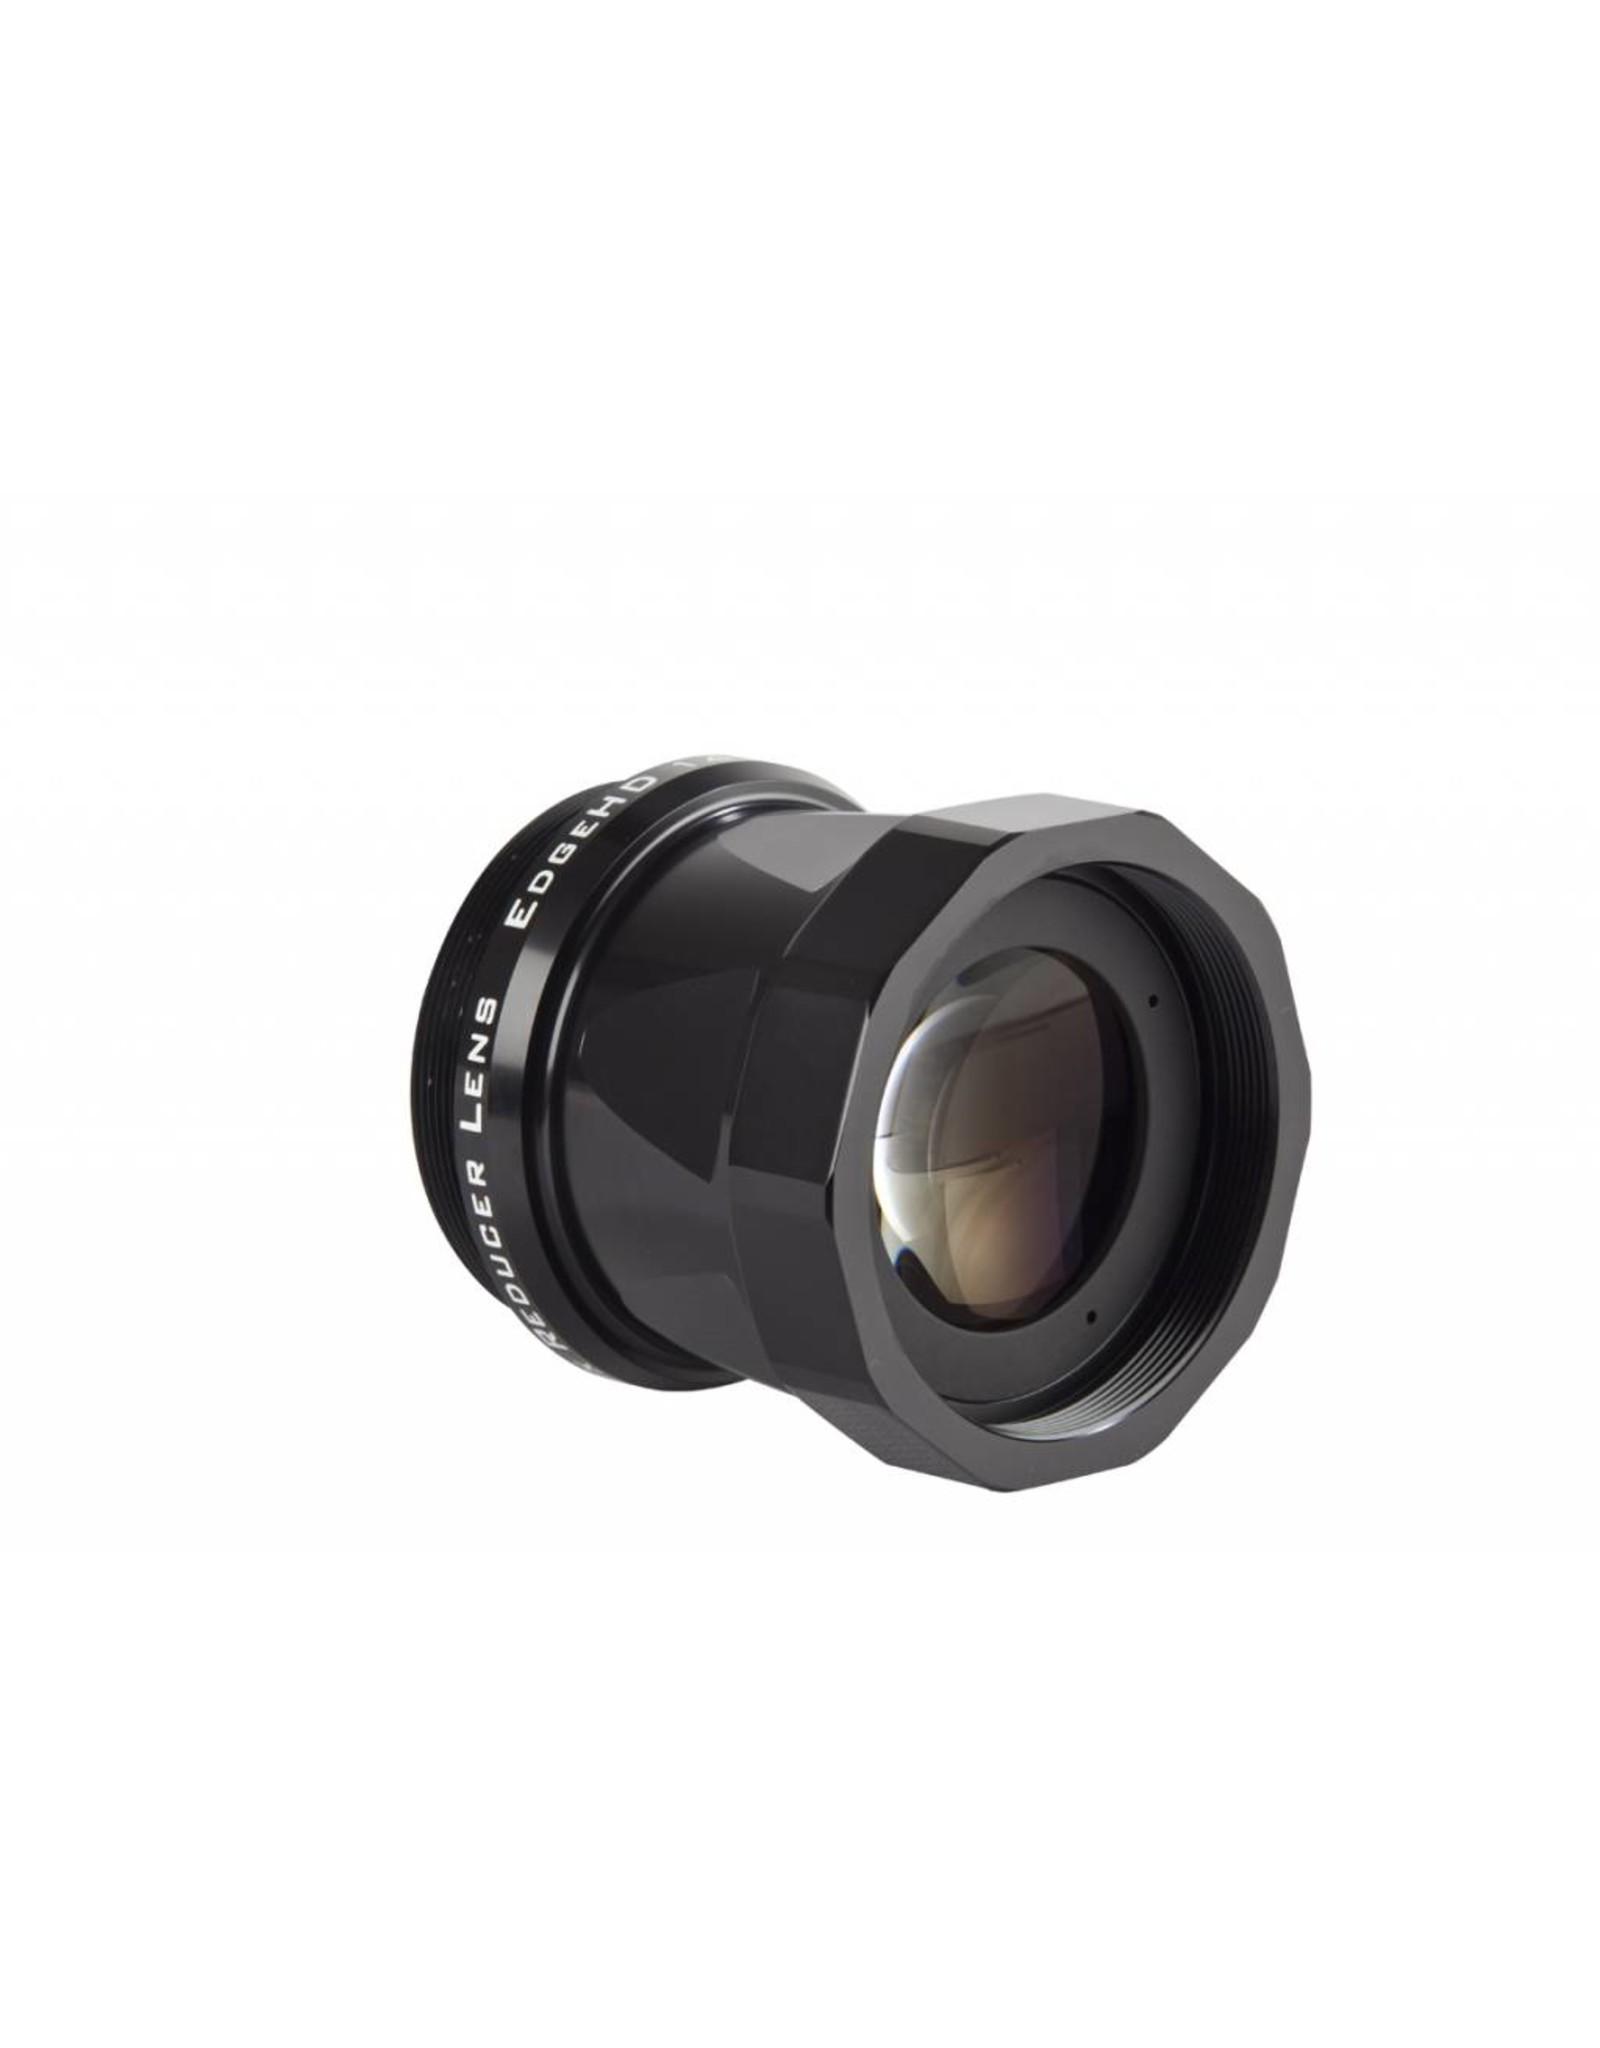 Celestron Celestron Reducer Lens .7x - EdgeHD 1400